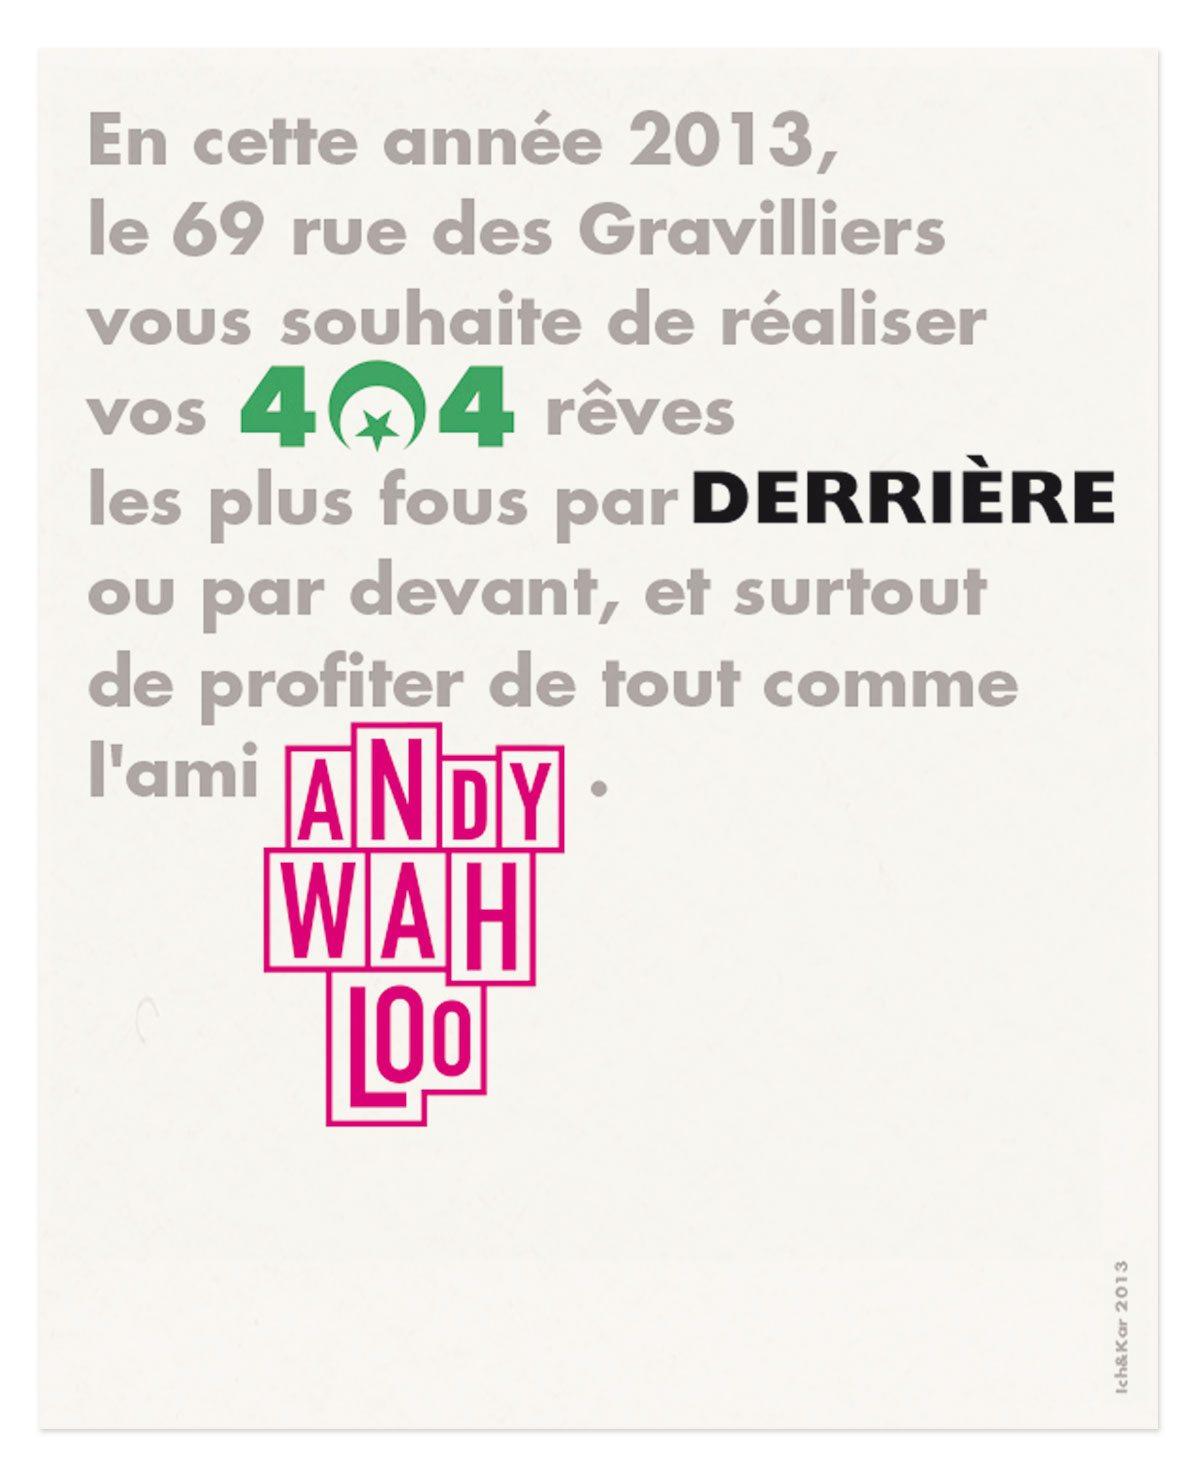 404 derrière andy wahloo 69 rue des gravilliers vœux 2013